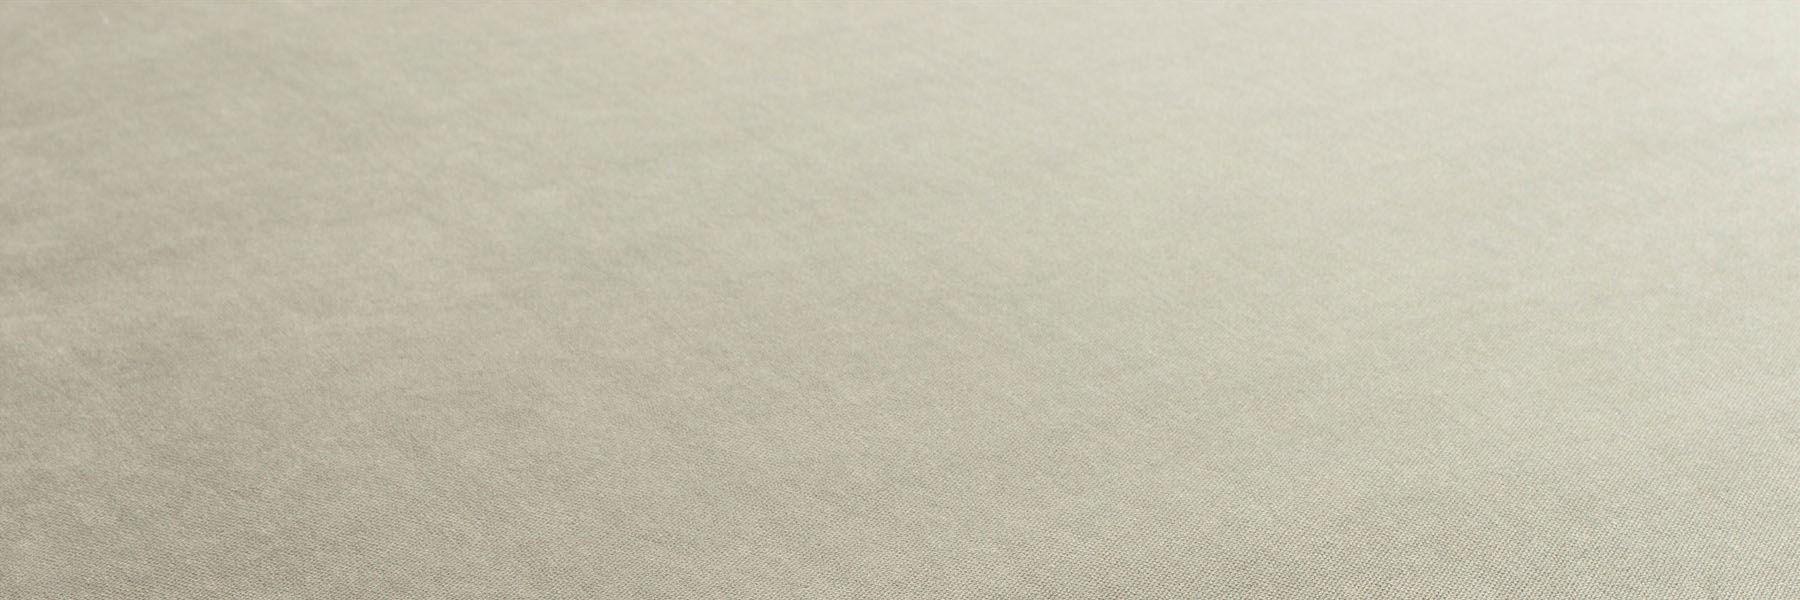 upholstery fabric champion 1 3114 092 jab anstoetz. Black Bedroom Furniture Sets. Home Design Ideas